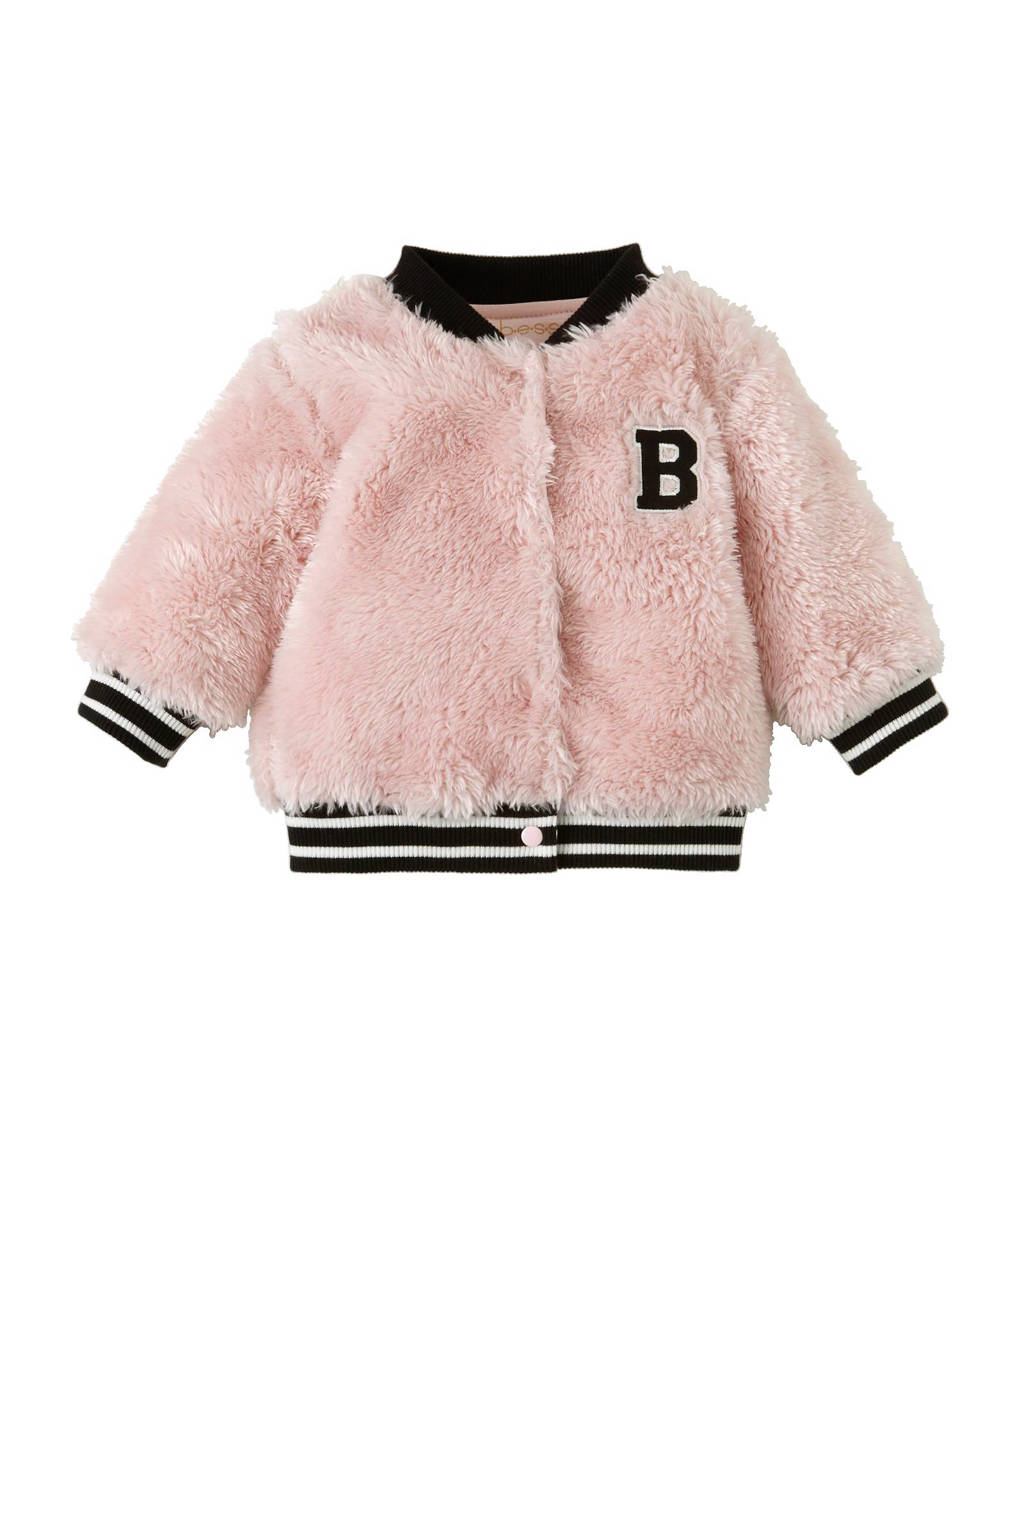 B.E.S.S newborn vest, Lichtroze/ zwart/ wit